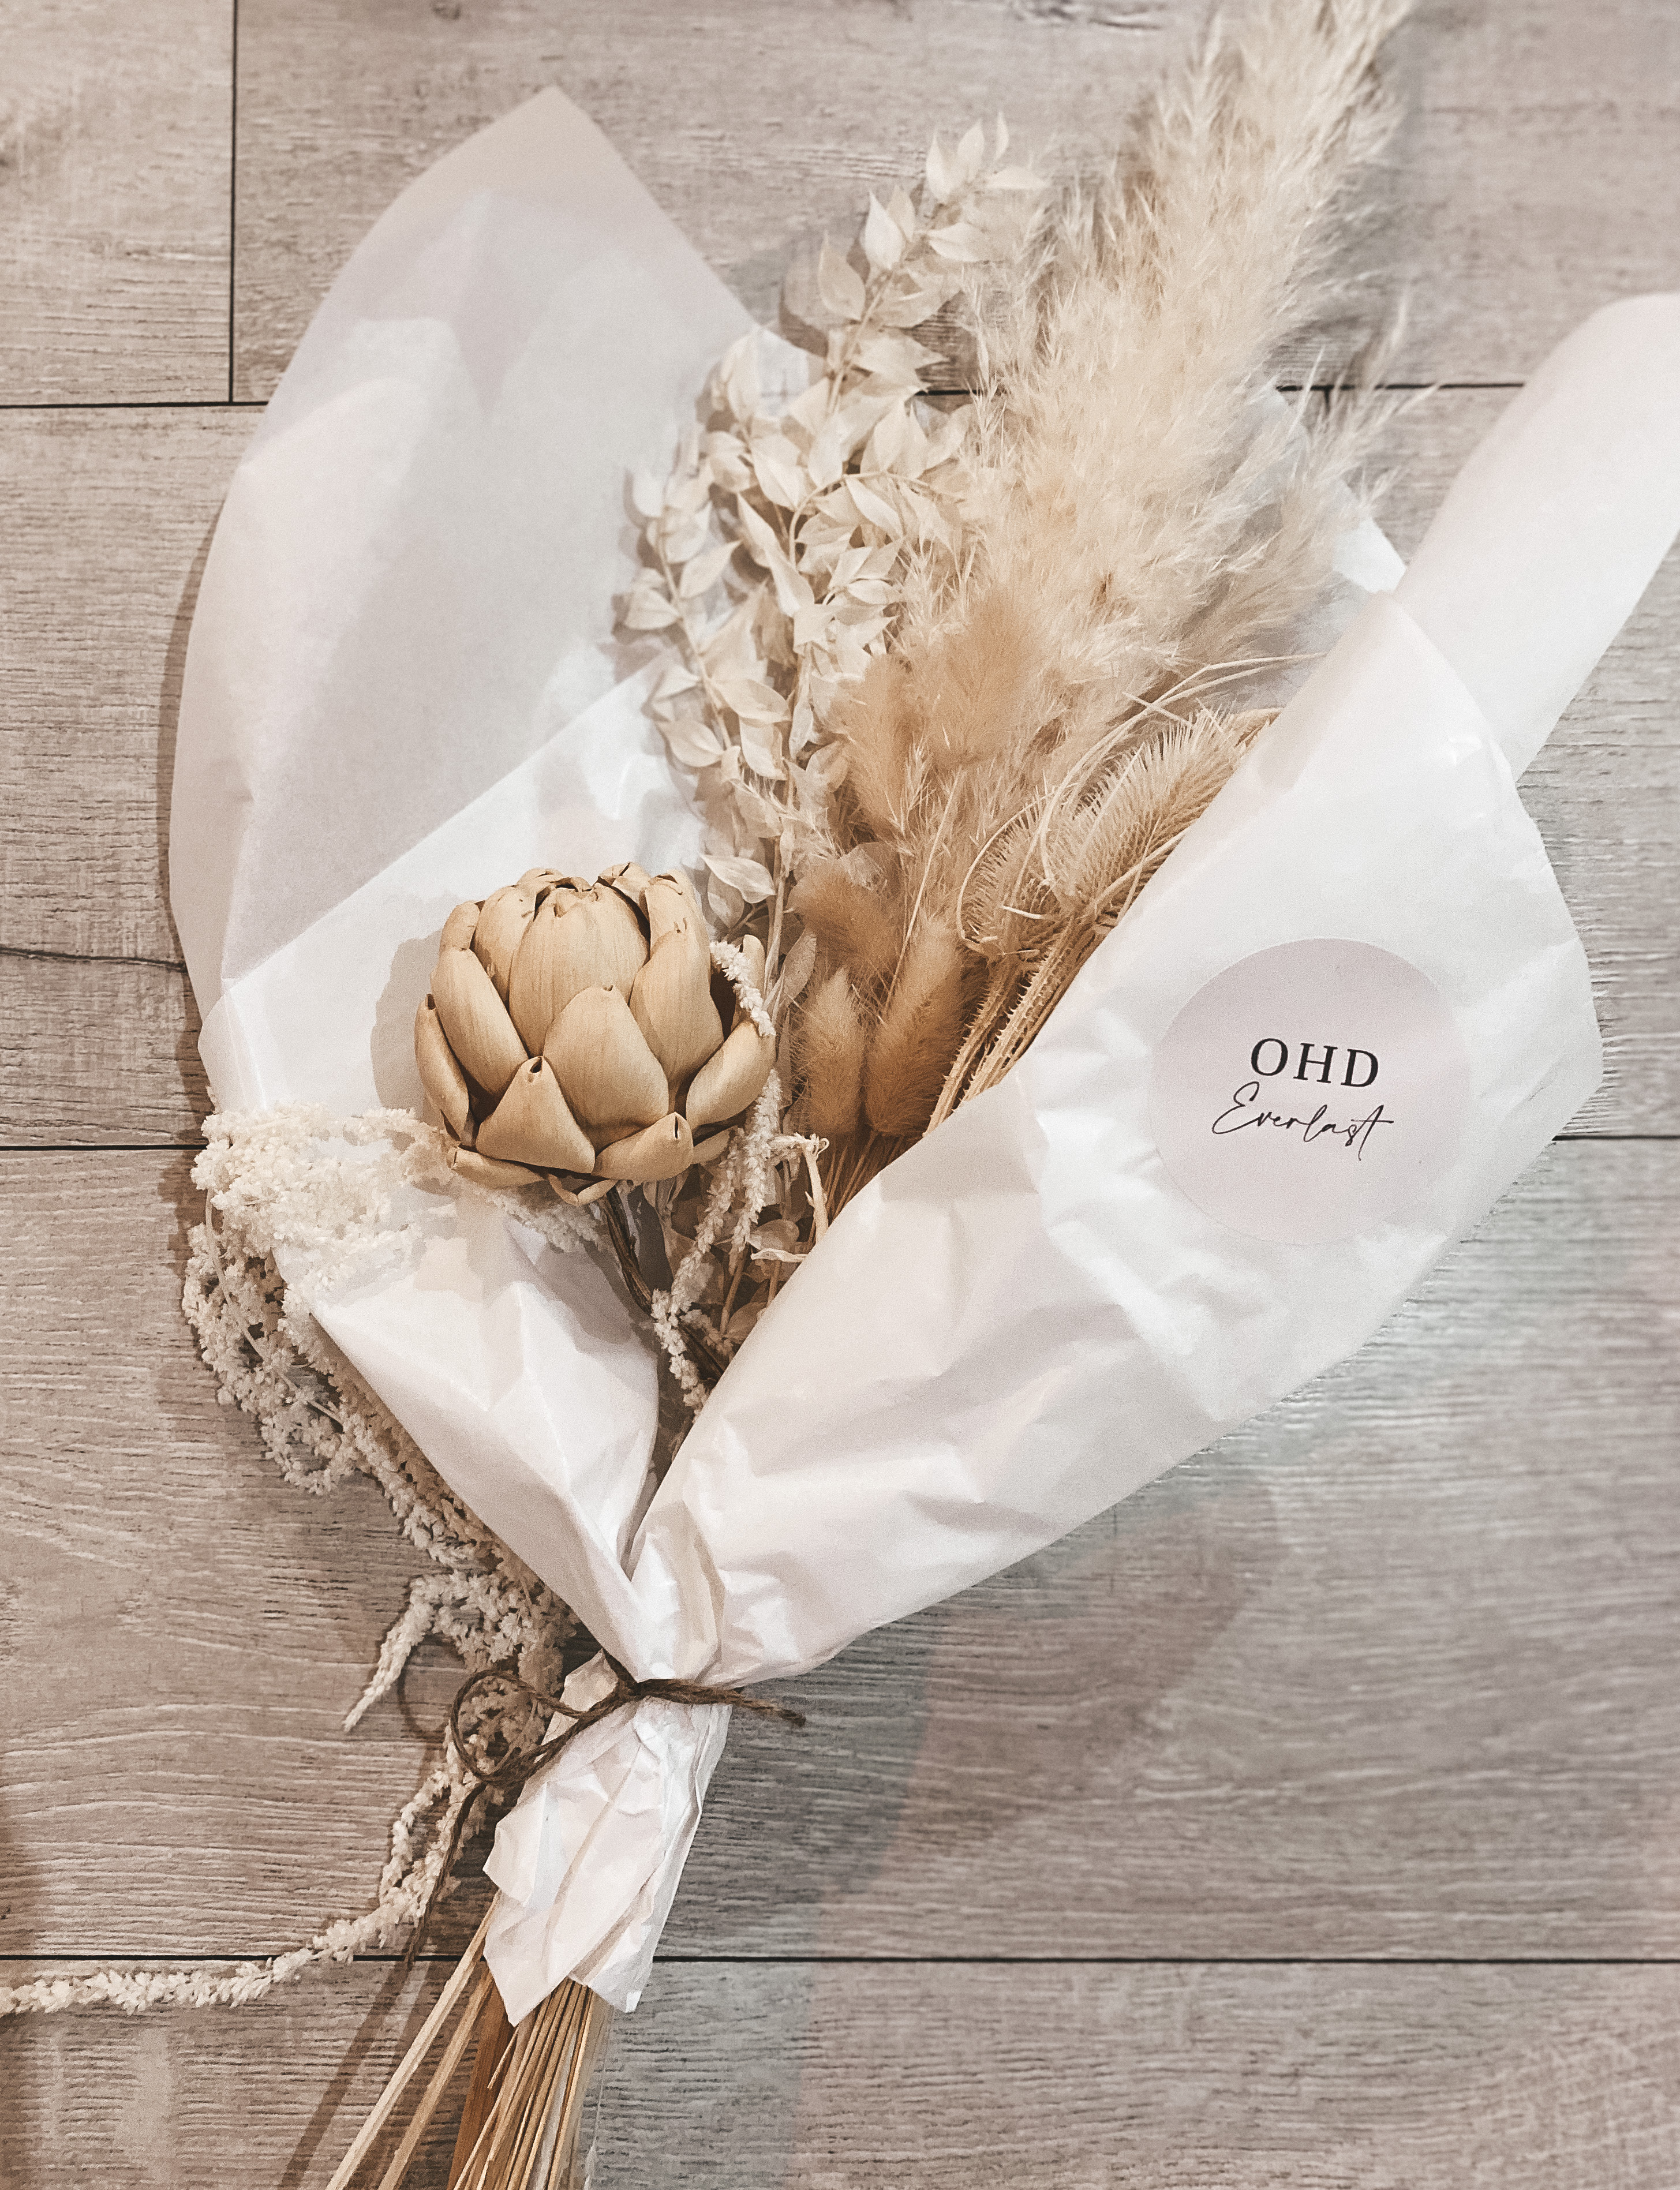 OHD Everlast - Natural Bouquet